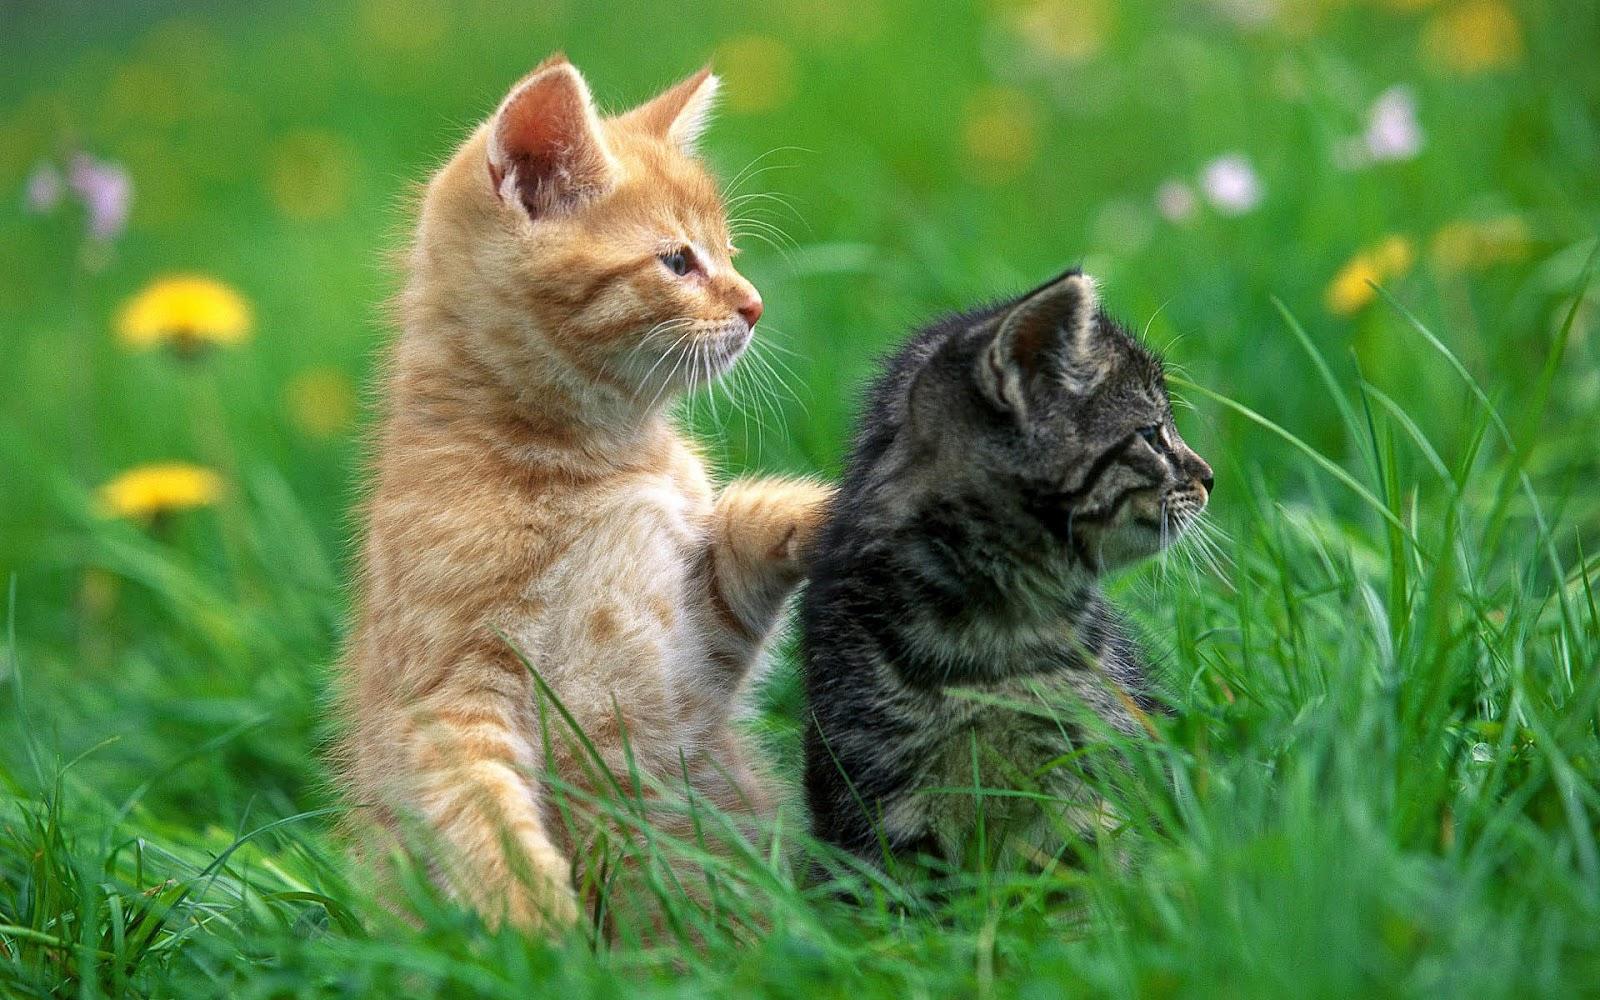 http://1.bp.blogspot.com/-CyyhdlbDVDo/UCJLy3qkaPI/AAAAAAAAAEU/sdK58uDXLEE/s1600/hd-cats-wallpaper-with-two-cats-in-the-grass-cats-wallpapers.jpg